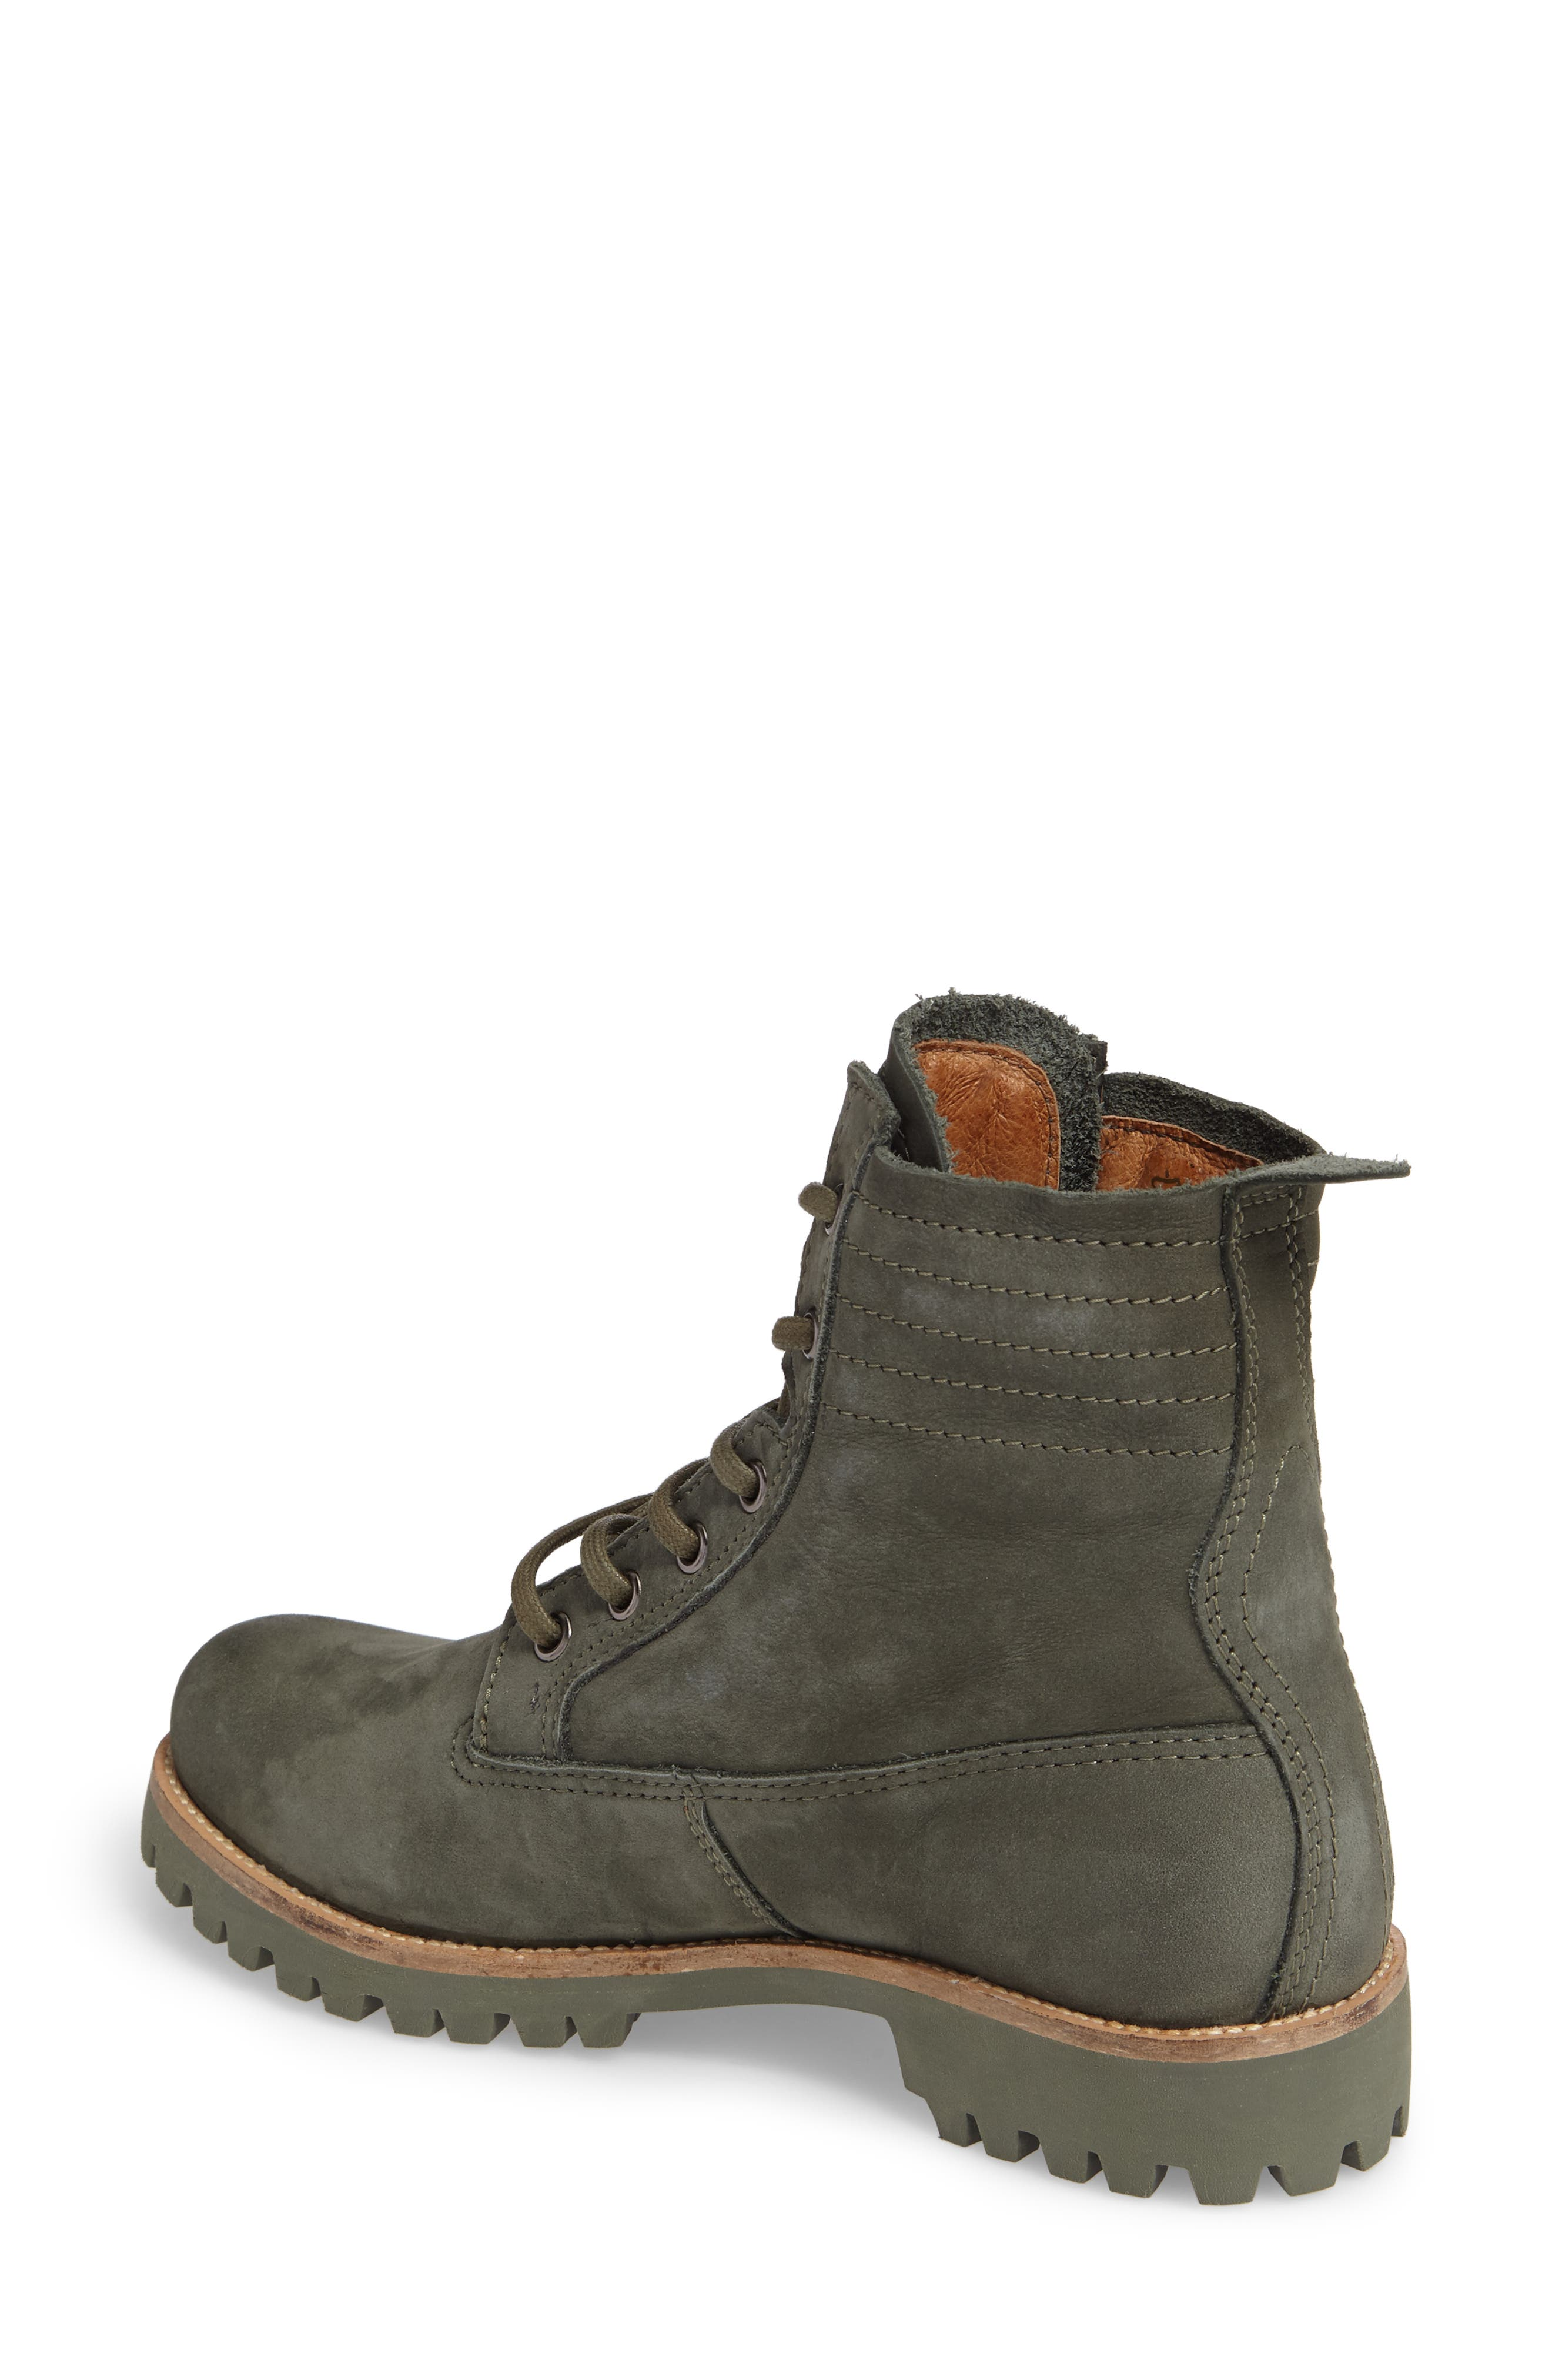 OL23 Lace-Up Boot,                             Alternate thumbnail 2, color,                             Dark Green Nubuck